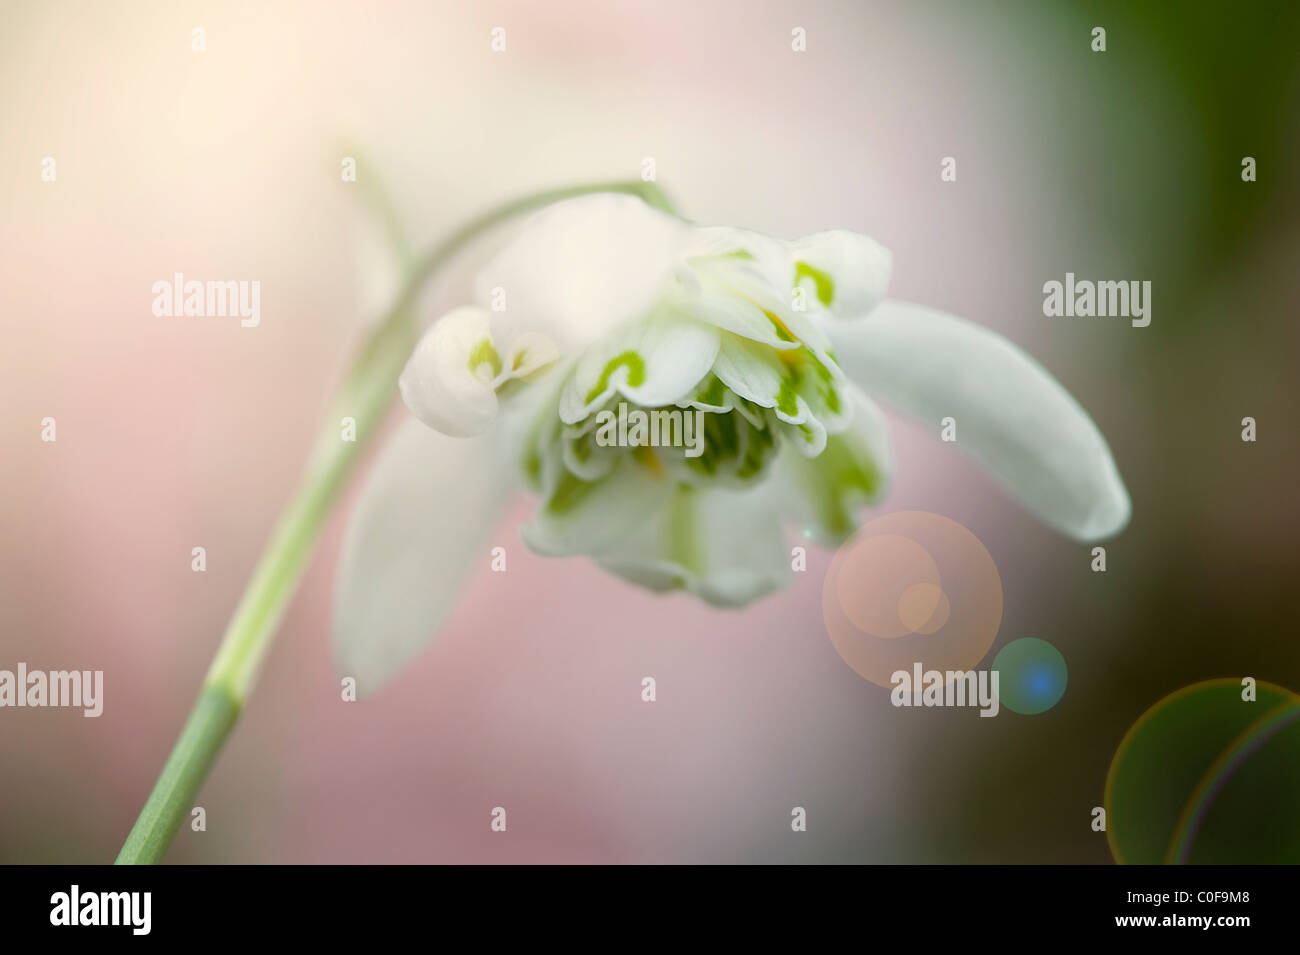 Double flowering Snowdrop - Galanthus nivalis f. pleniflorus 'Flore Pleno' - Stock Image